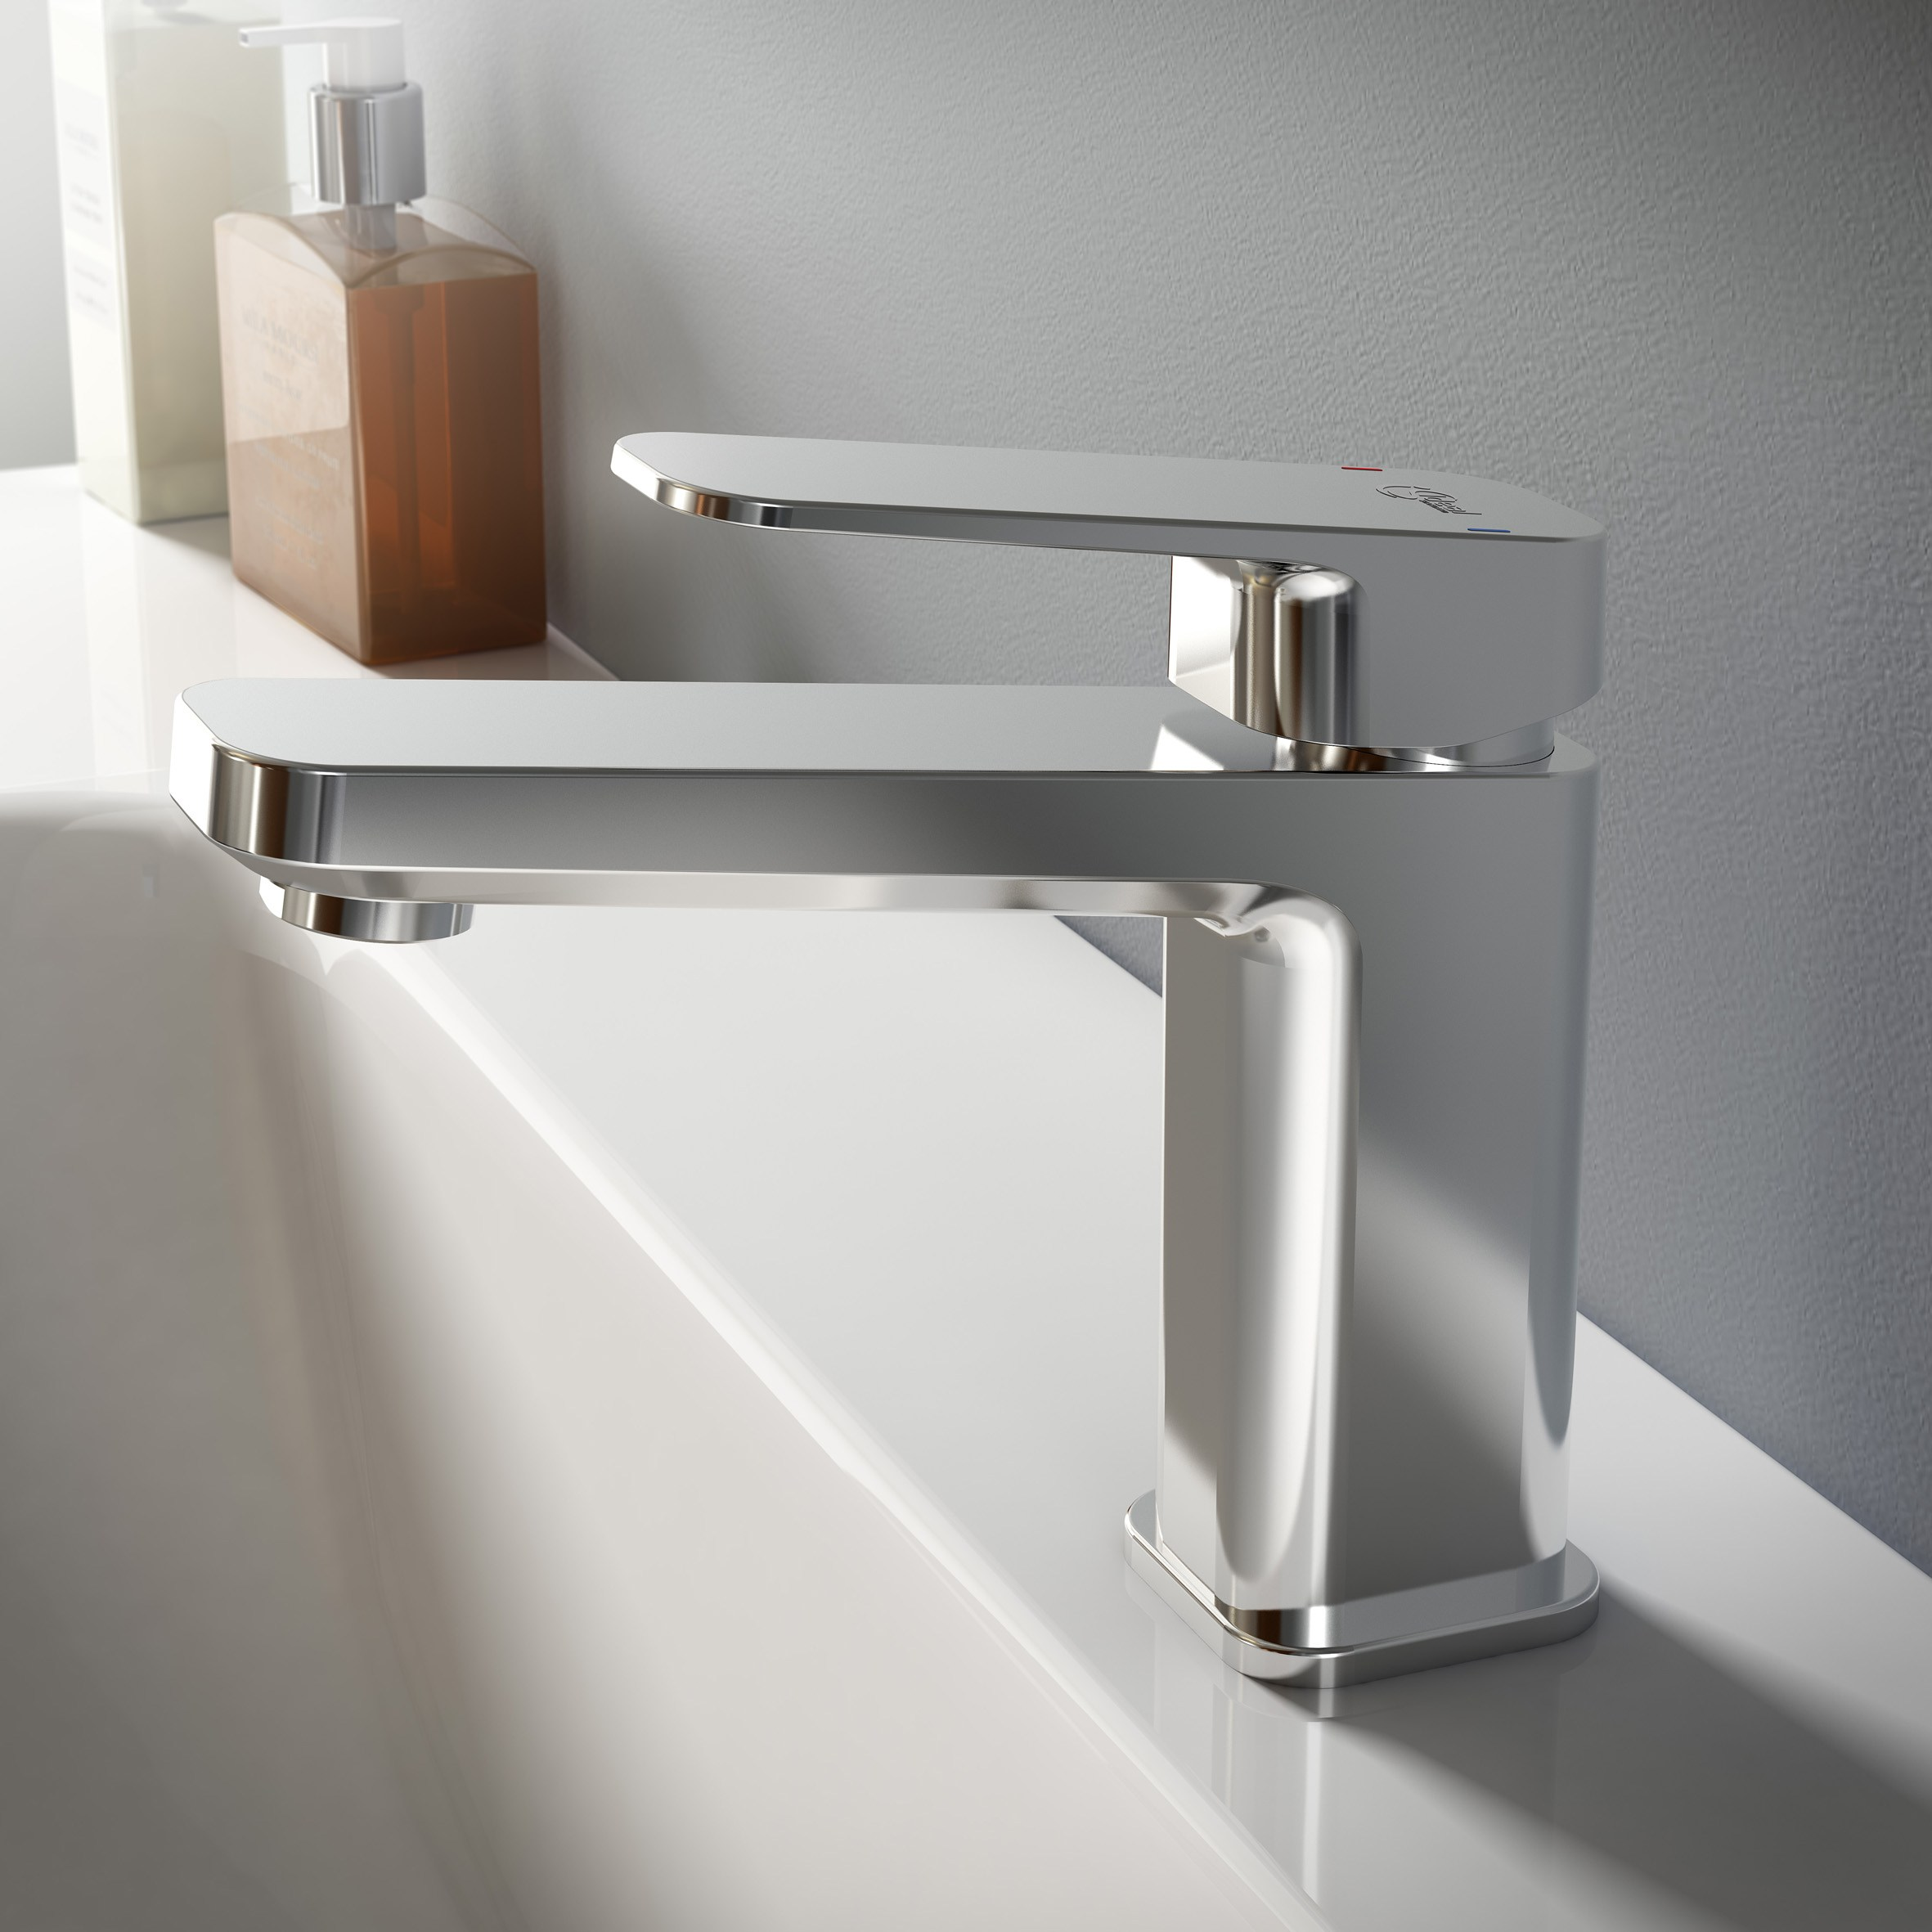 Bathroom furniture set TONIC II By Ideal Standard design ARTEFAKT industriekultur